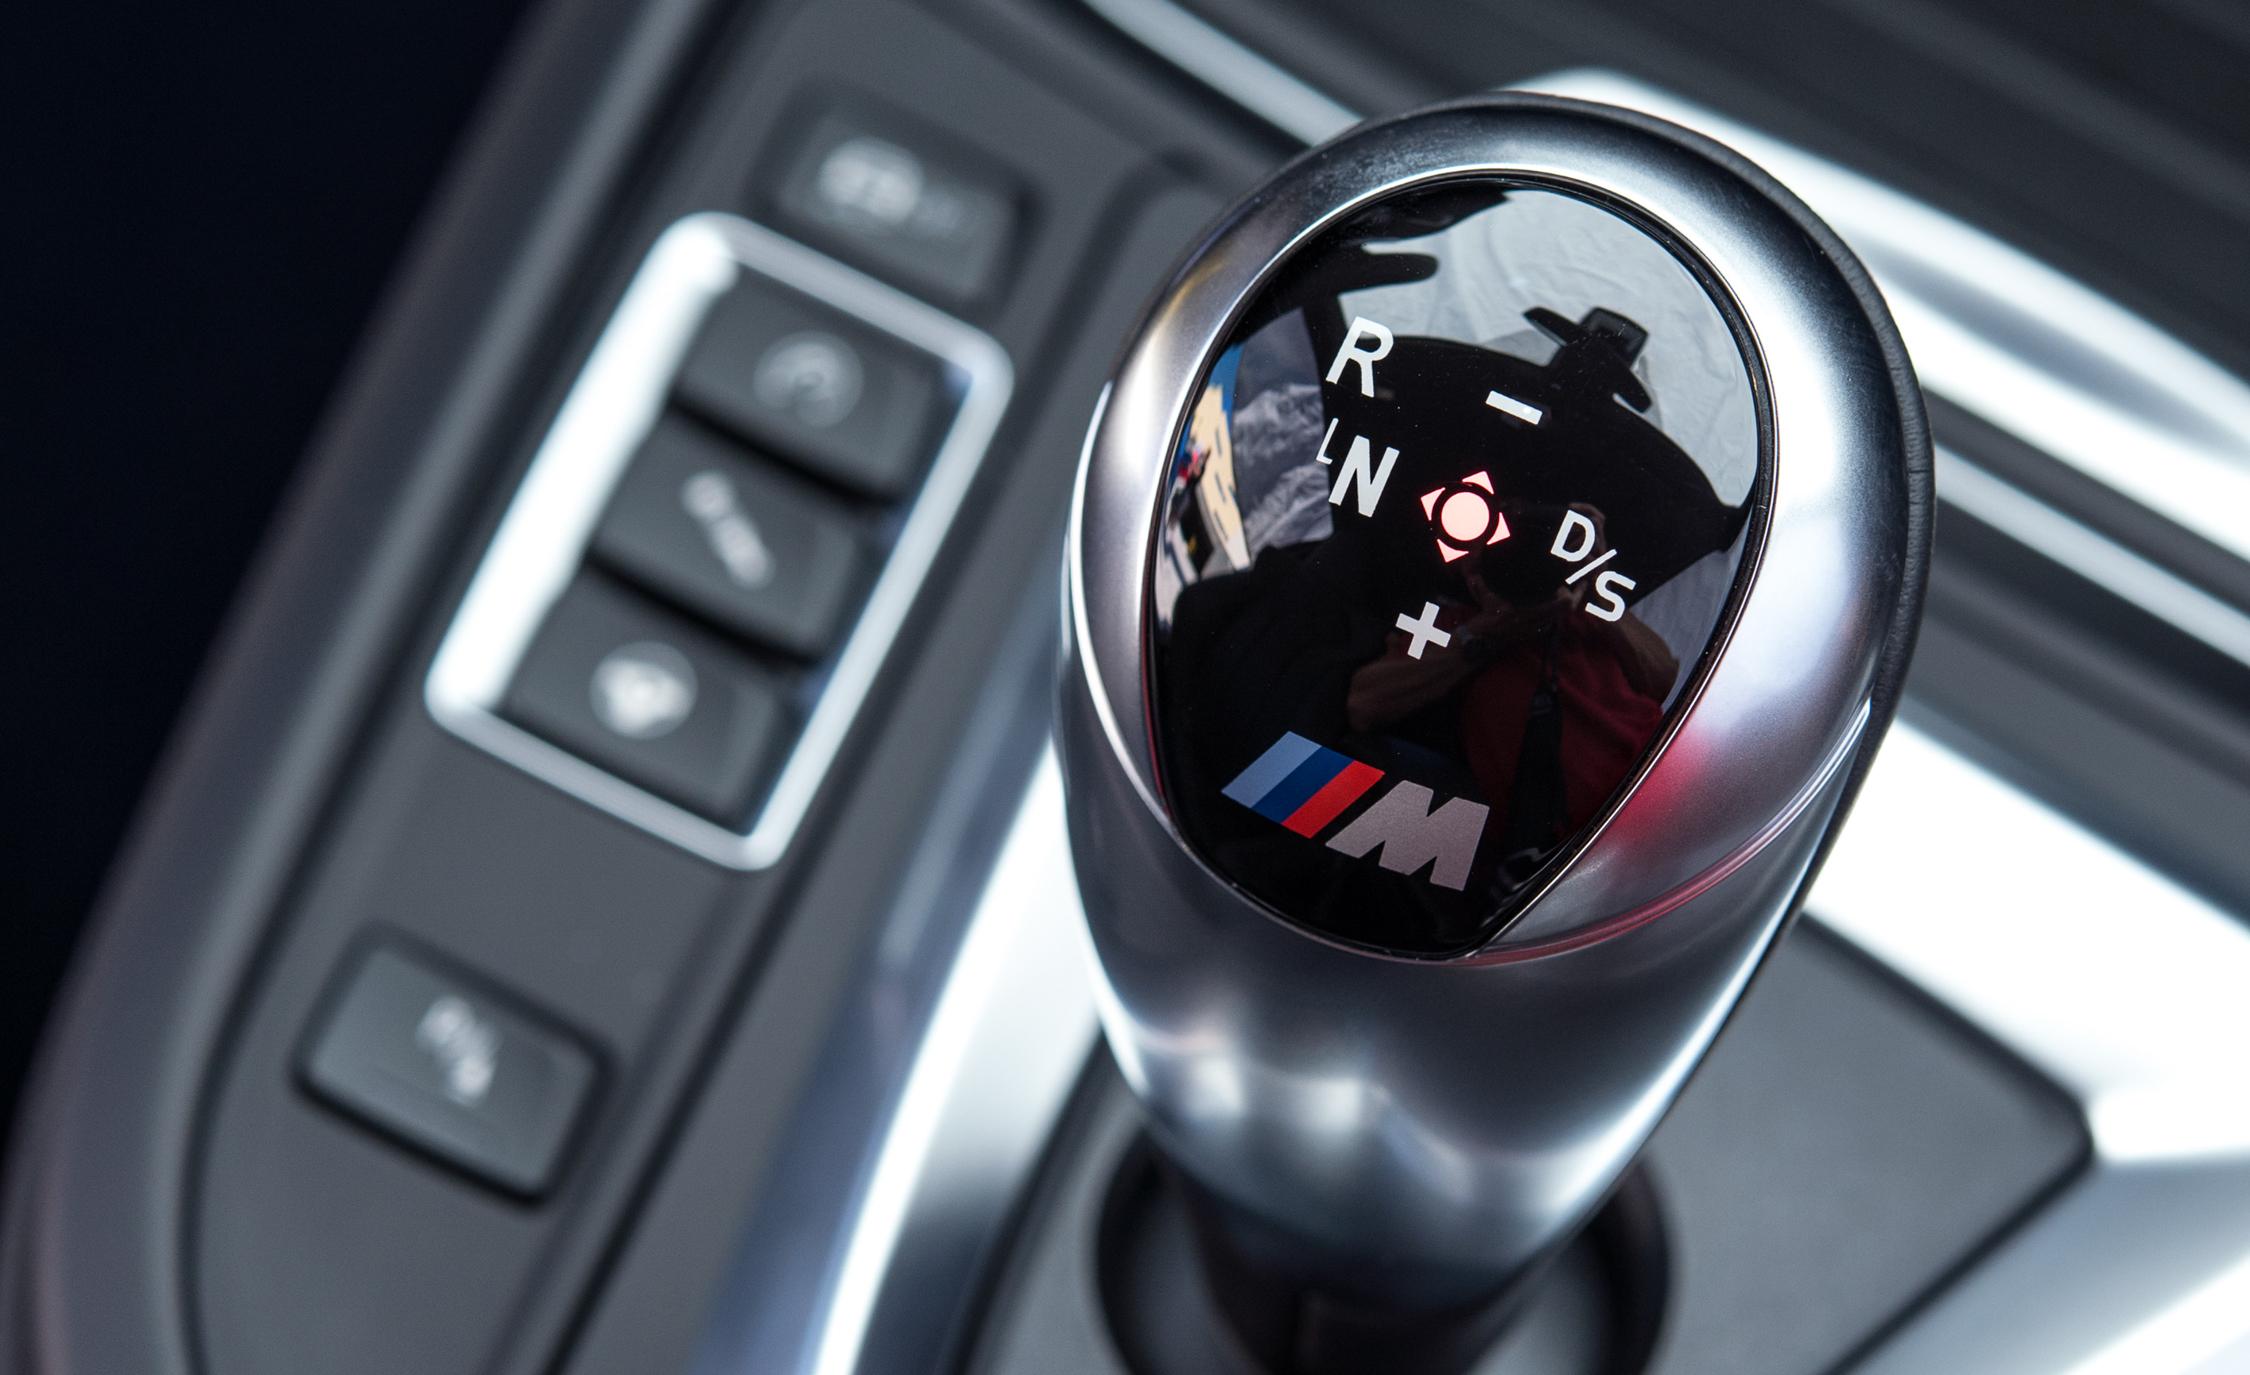 2015 BMW M4 Coupe Interior Gear Shift Knob